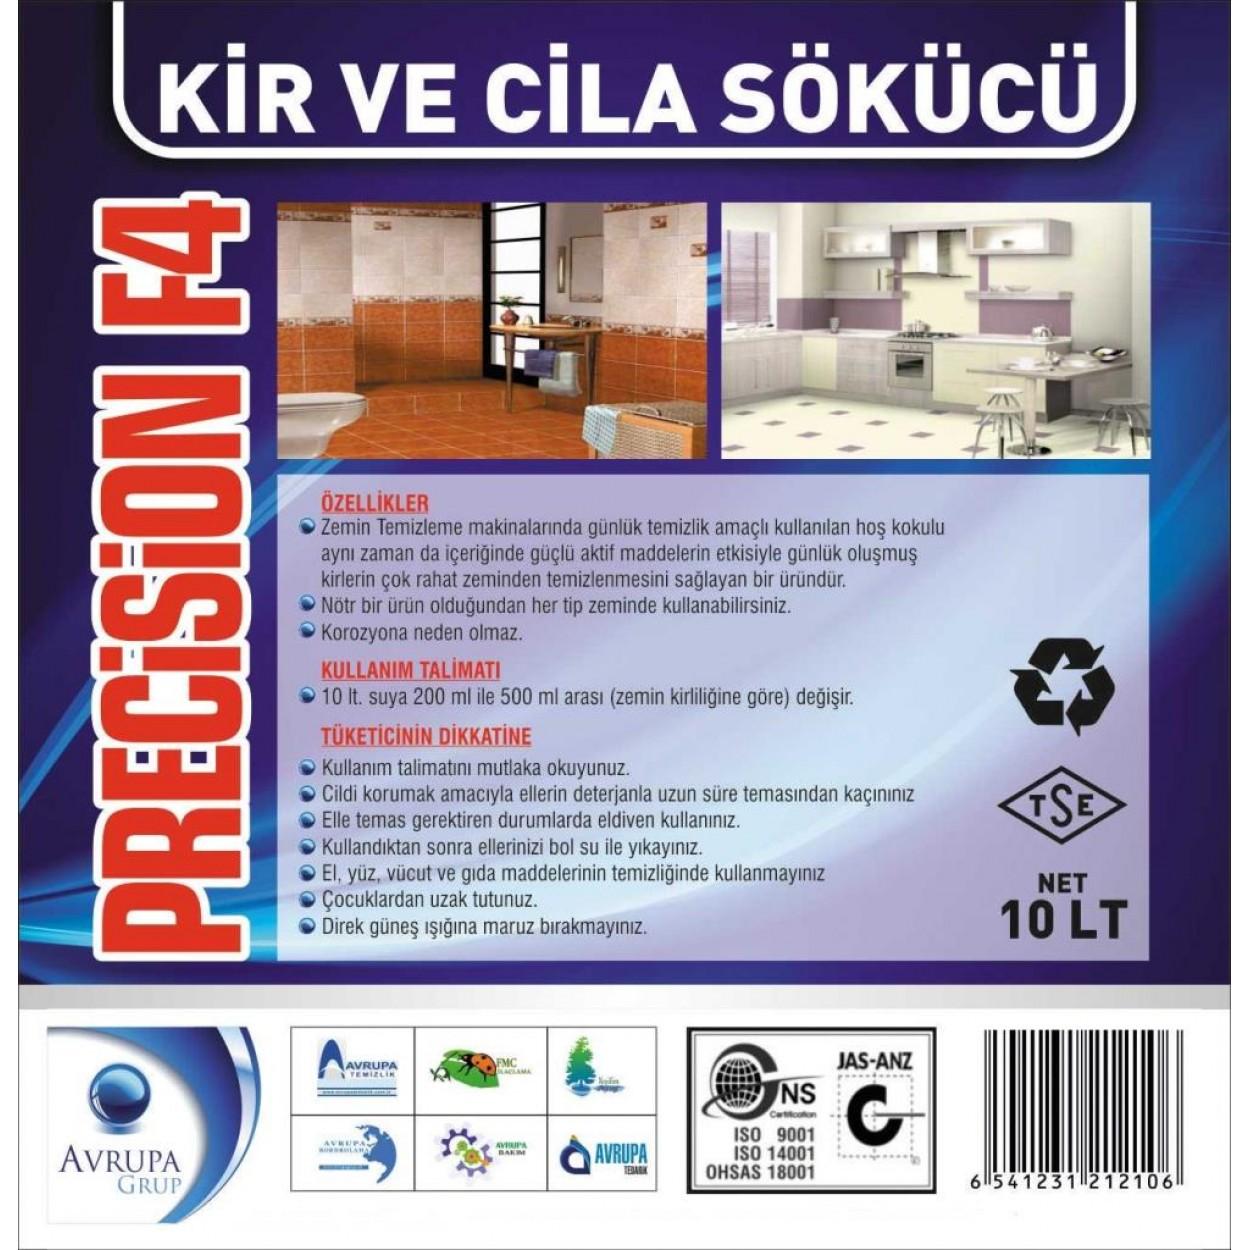 PRECİSİON F4 Kir ve Cila Sökücü 10 Litre